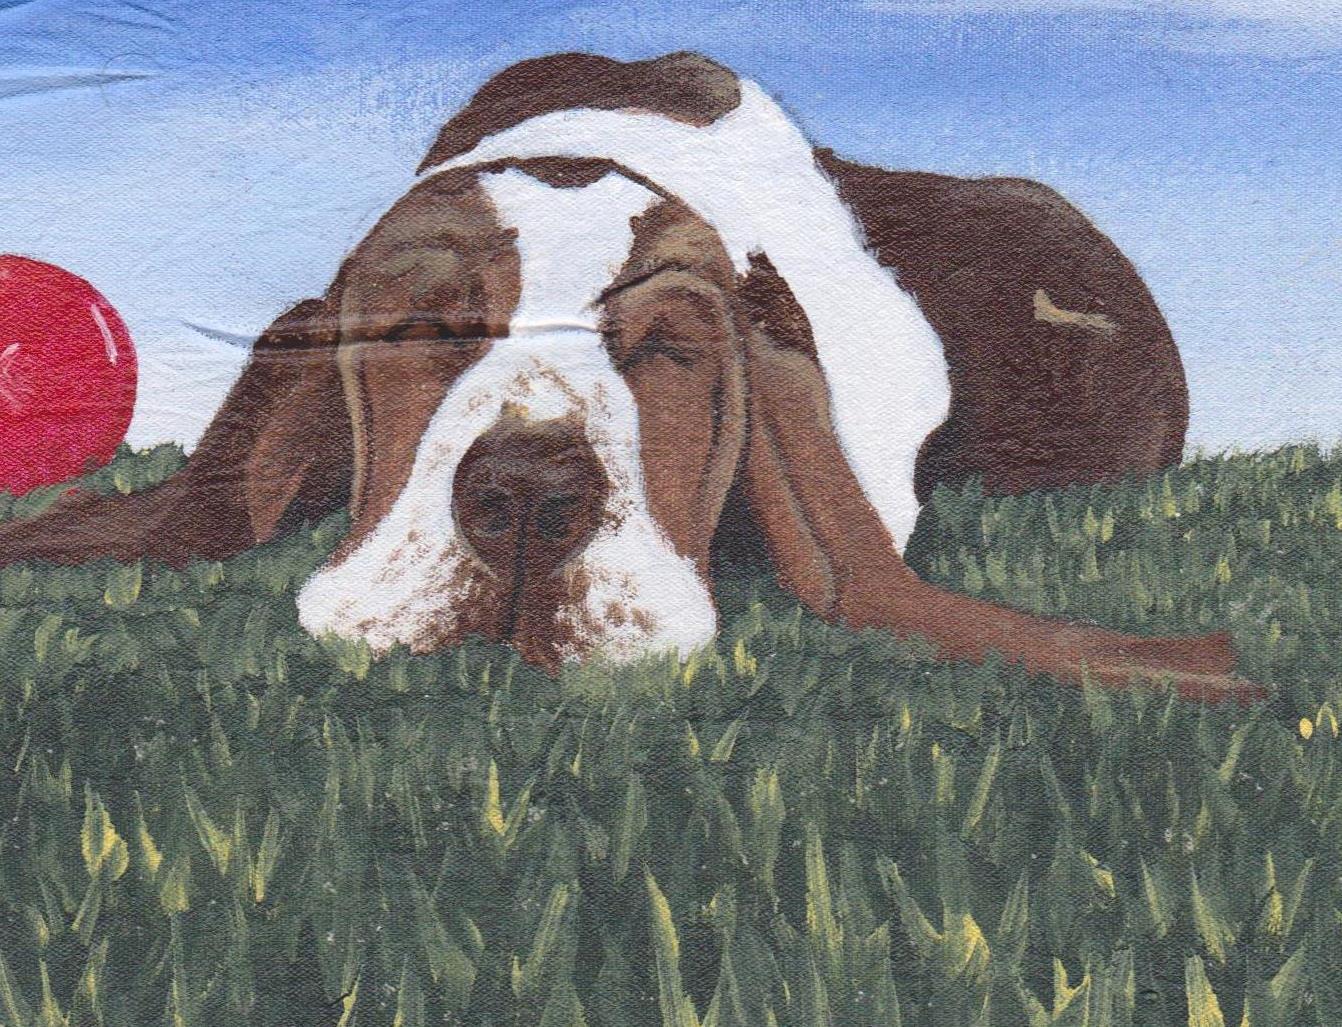 Scott North East Coast Inmate Artist Lazy Dog 001a.jpg